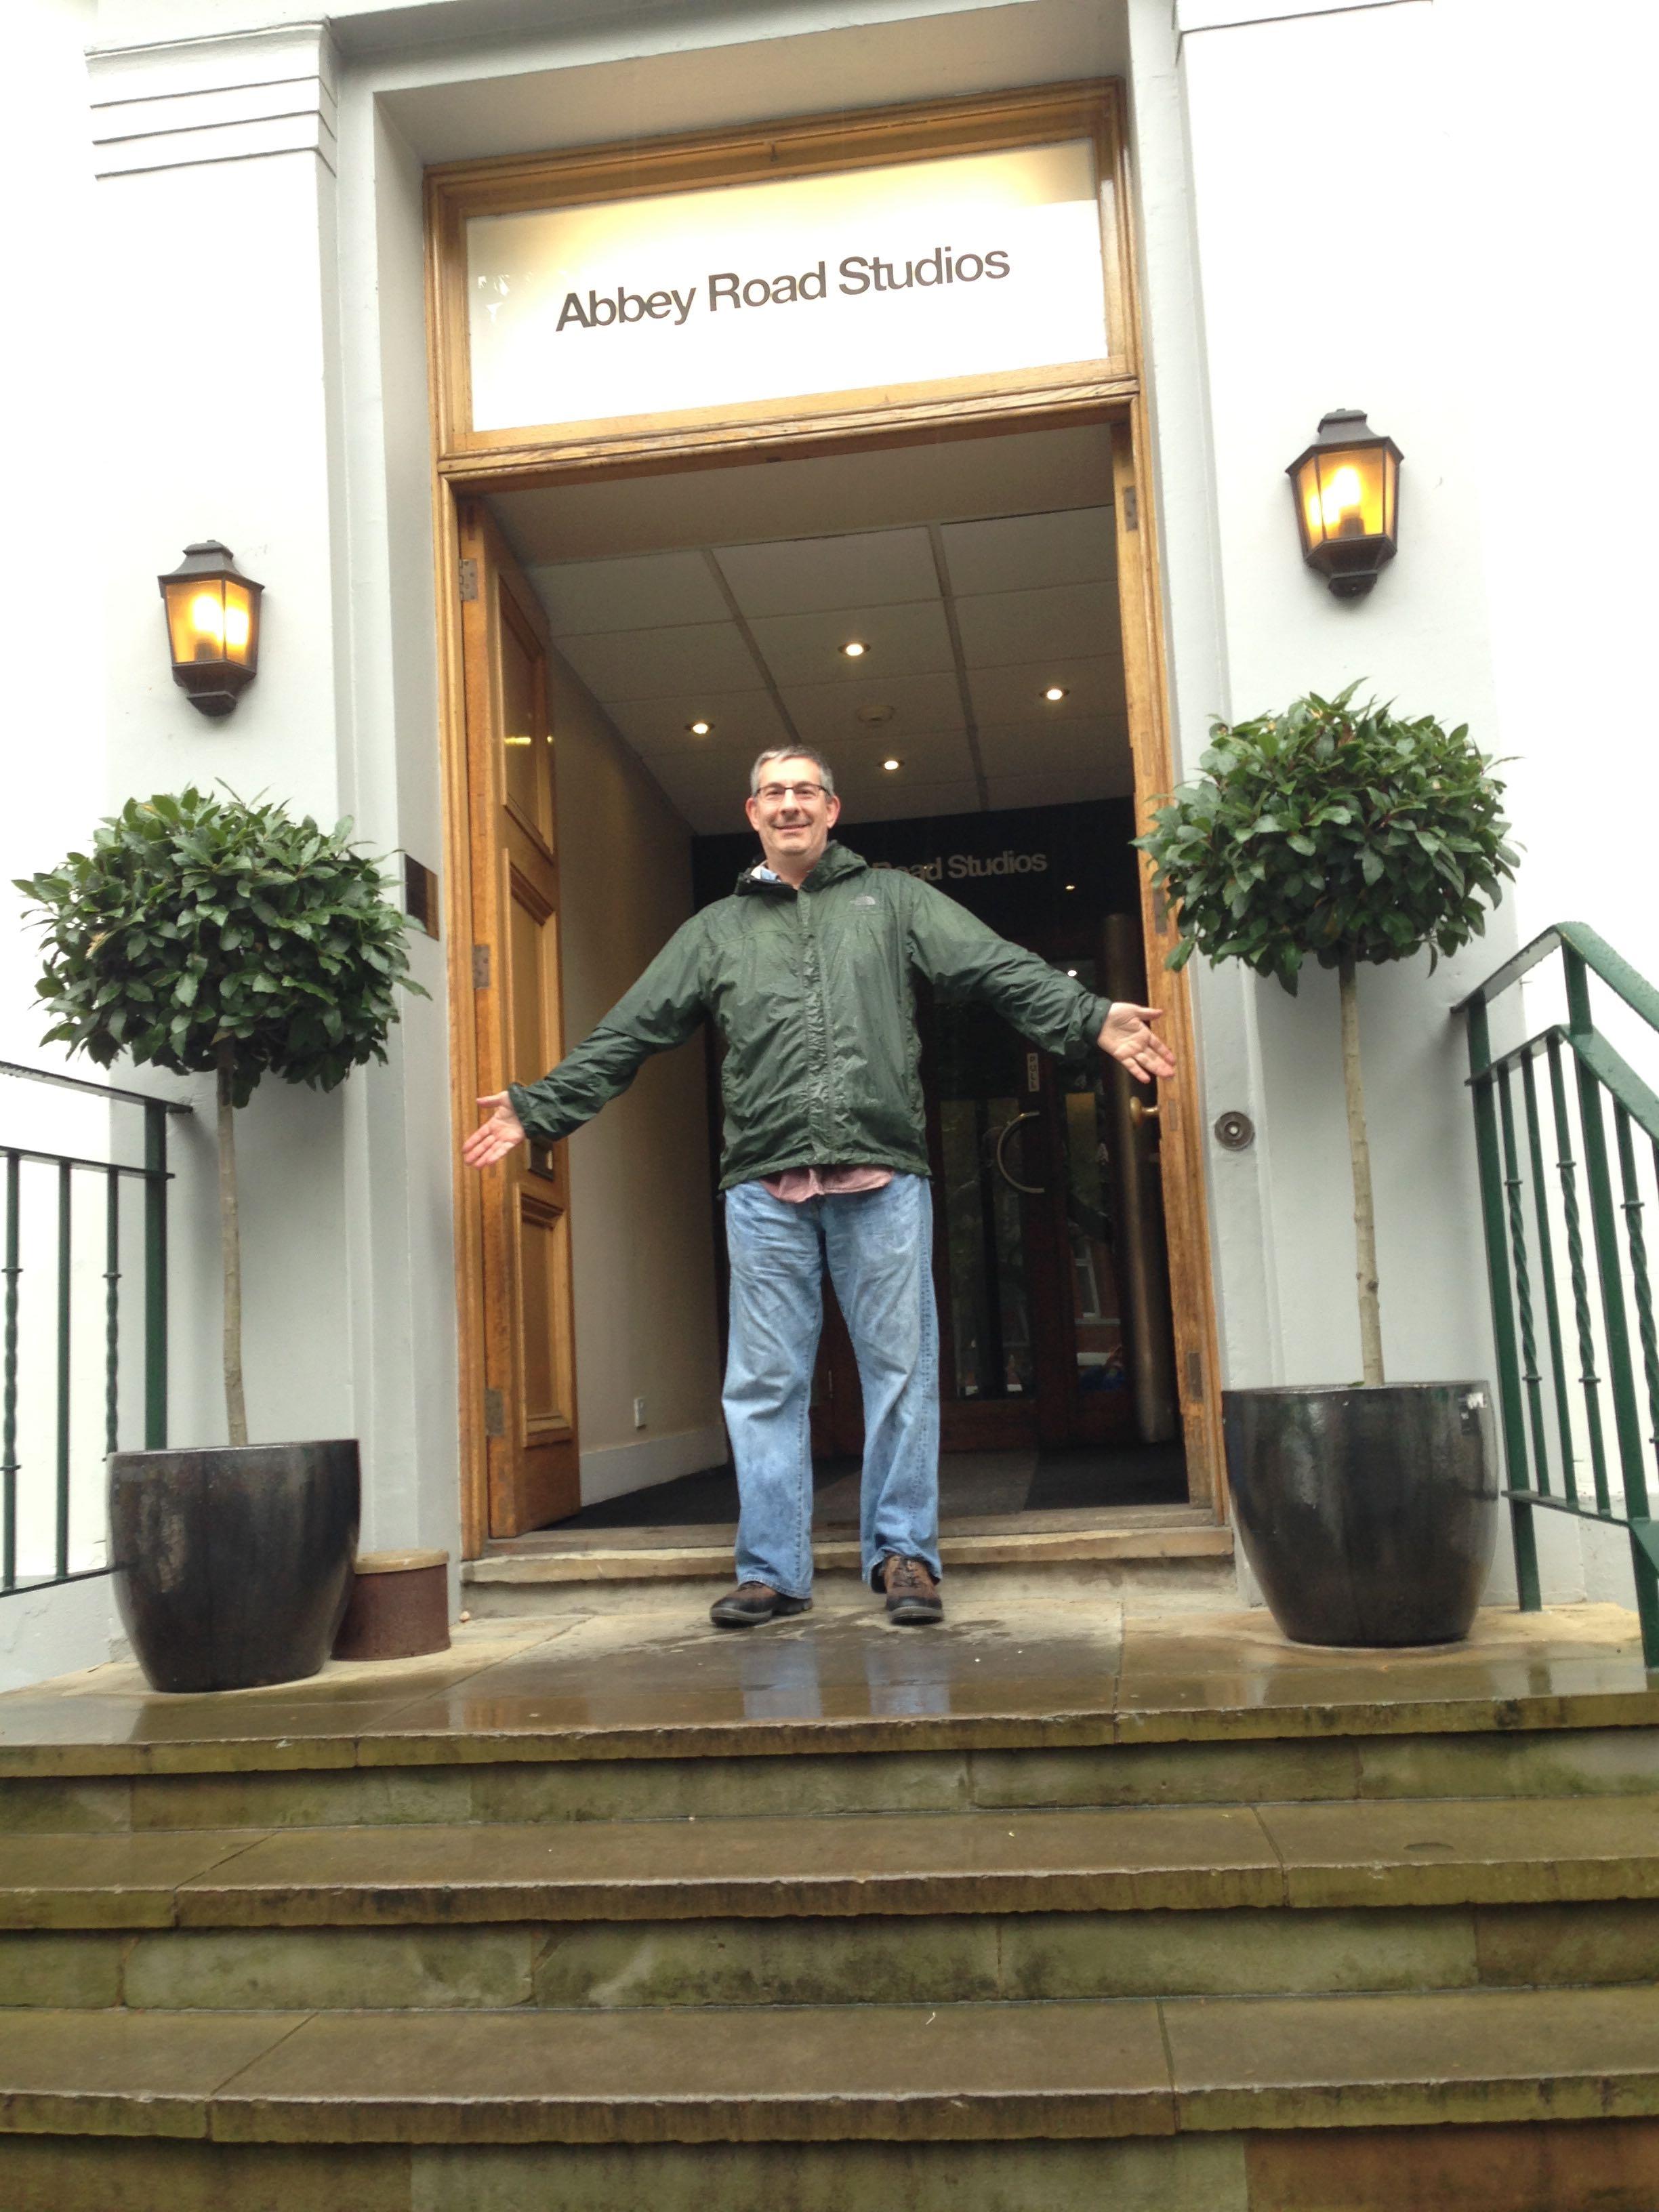 Scott at Abbey Road Studios